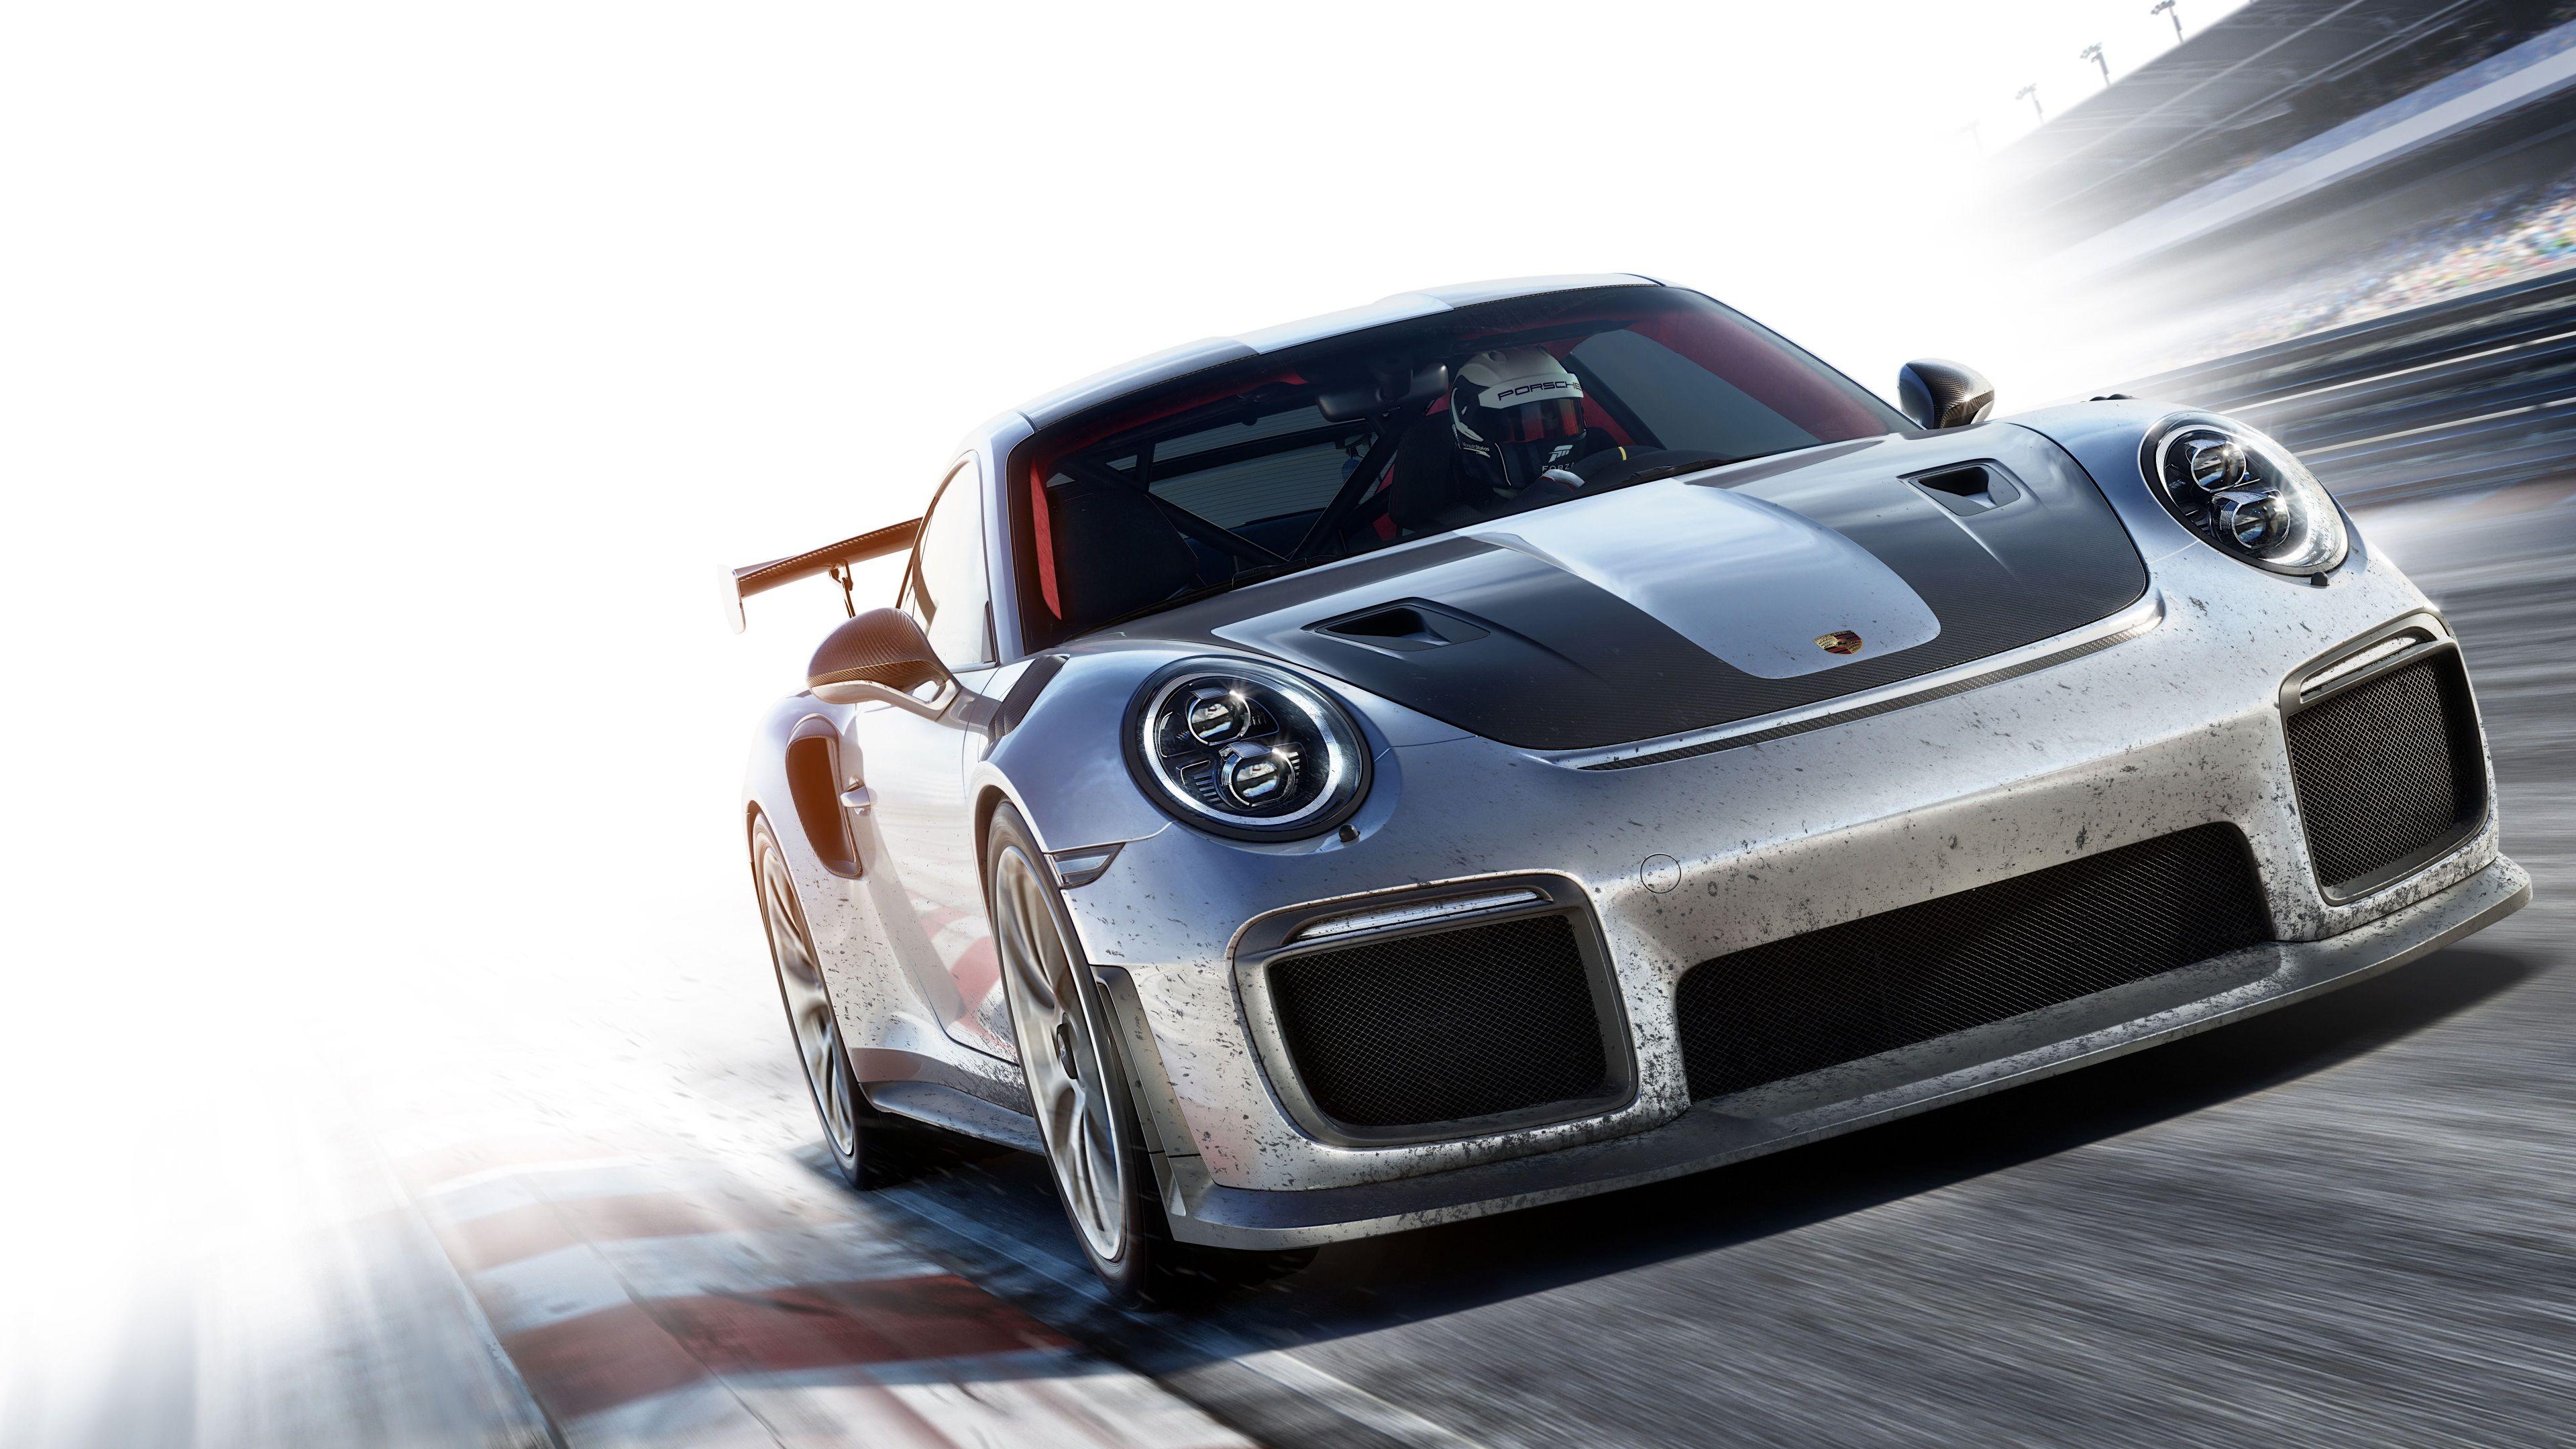 3840x2160 Forza Motorsport 7 4k Hd Wallpaper 1080p Forza Motorsport Porsche 911 Gt2 Rs Motorsport